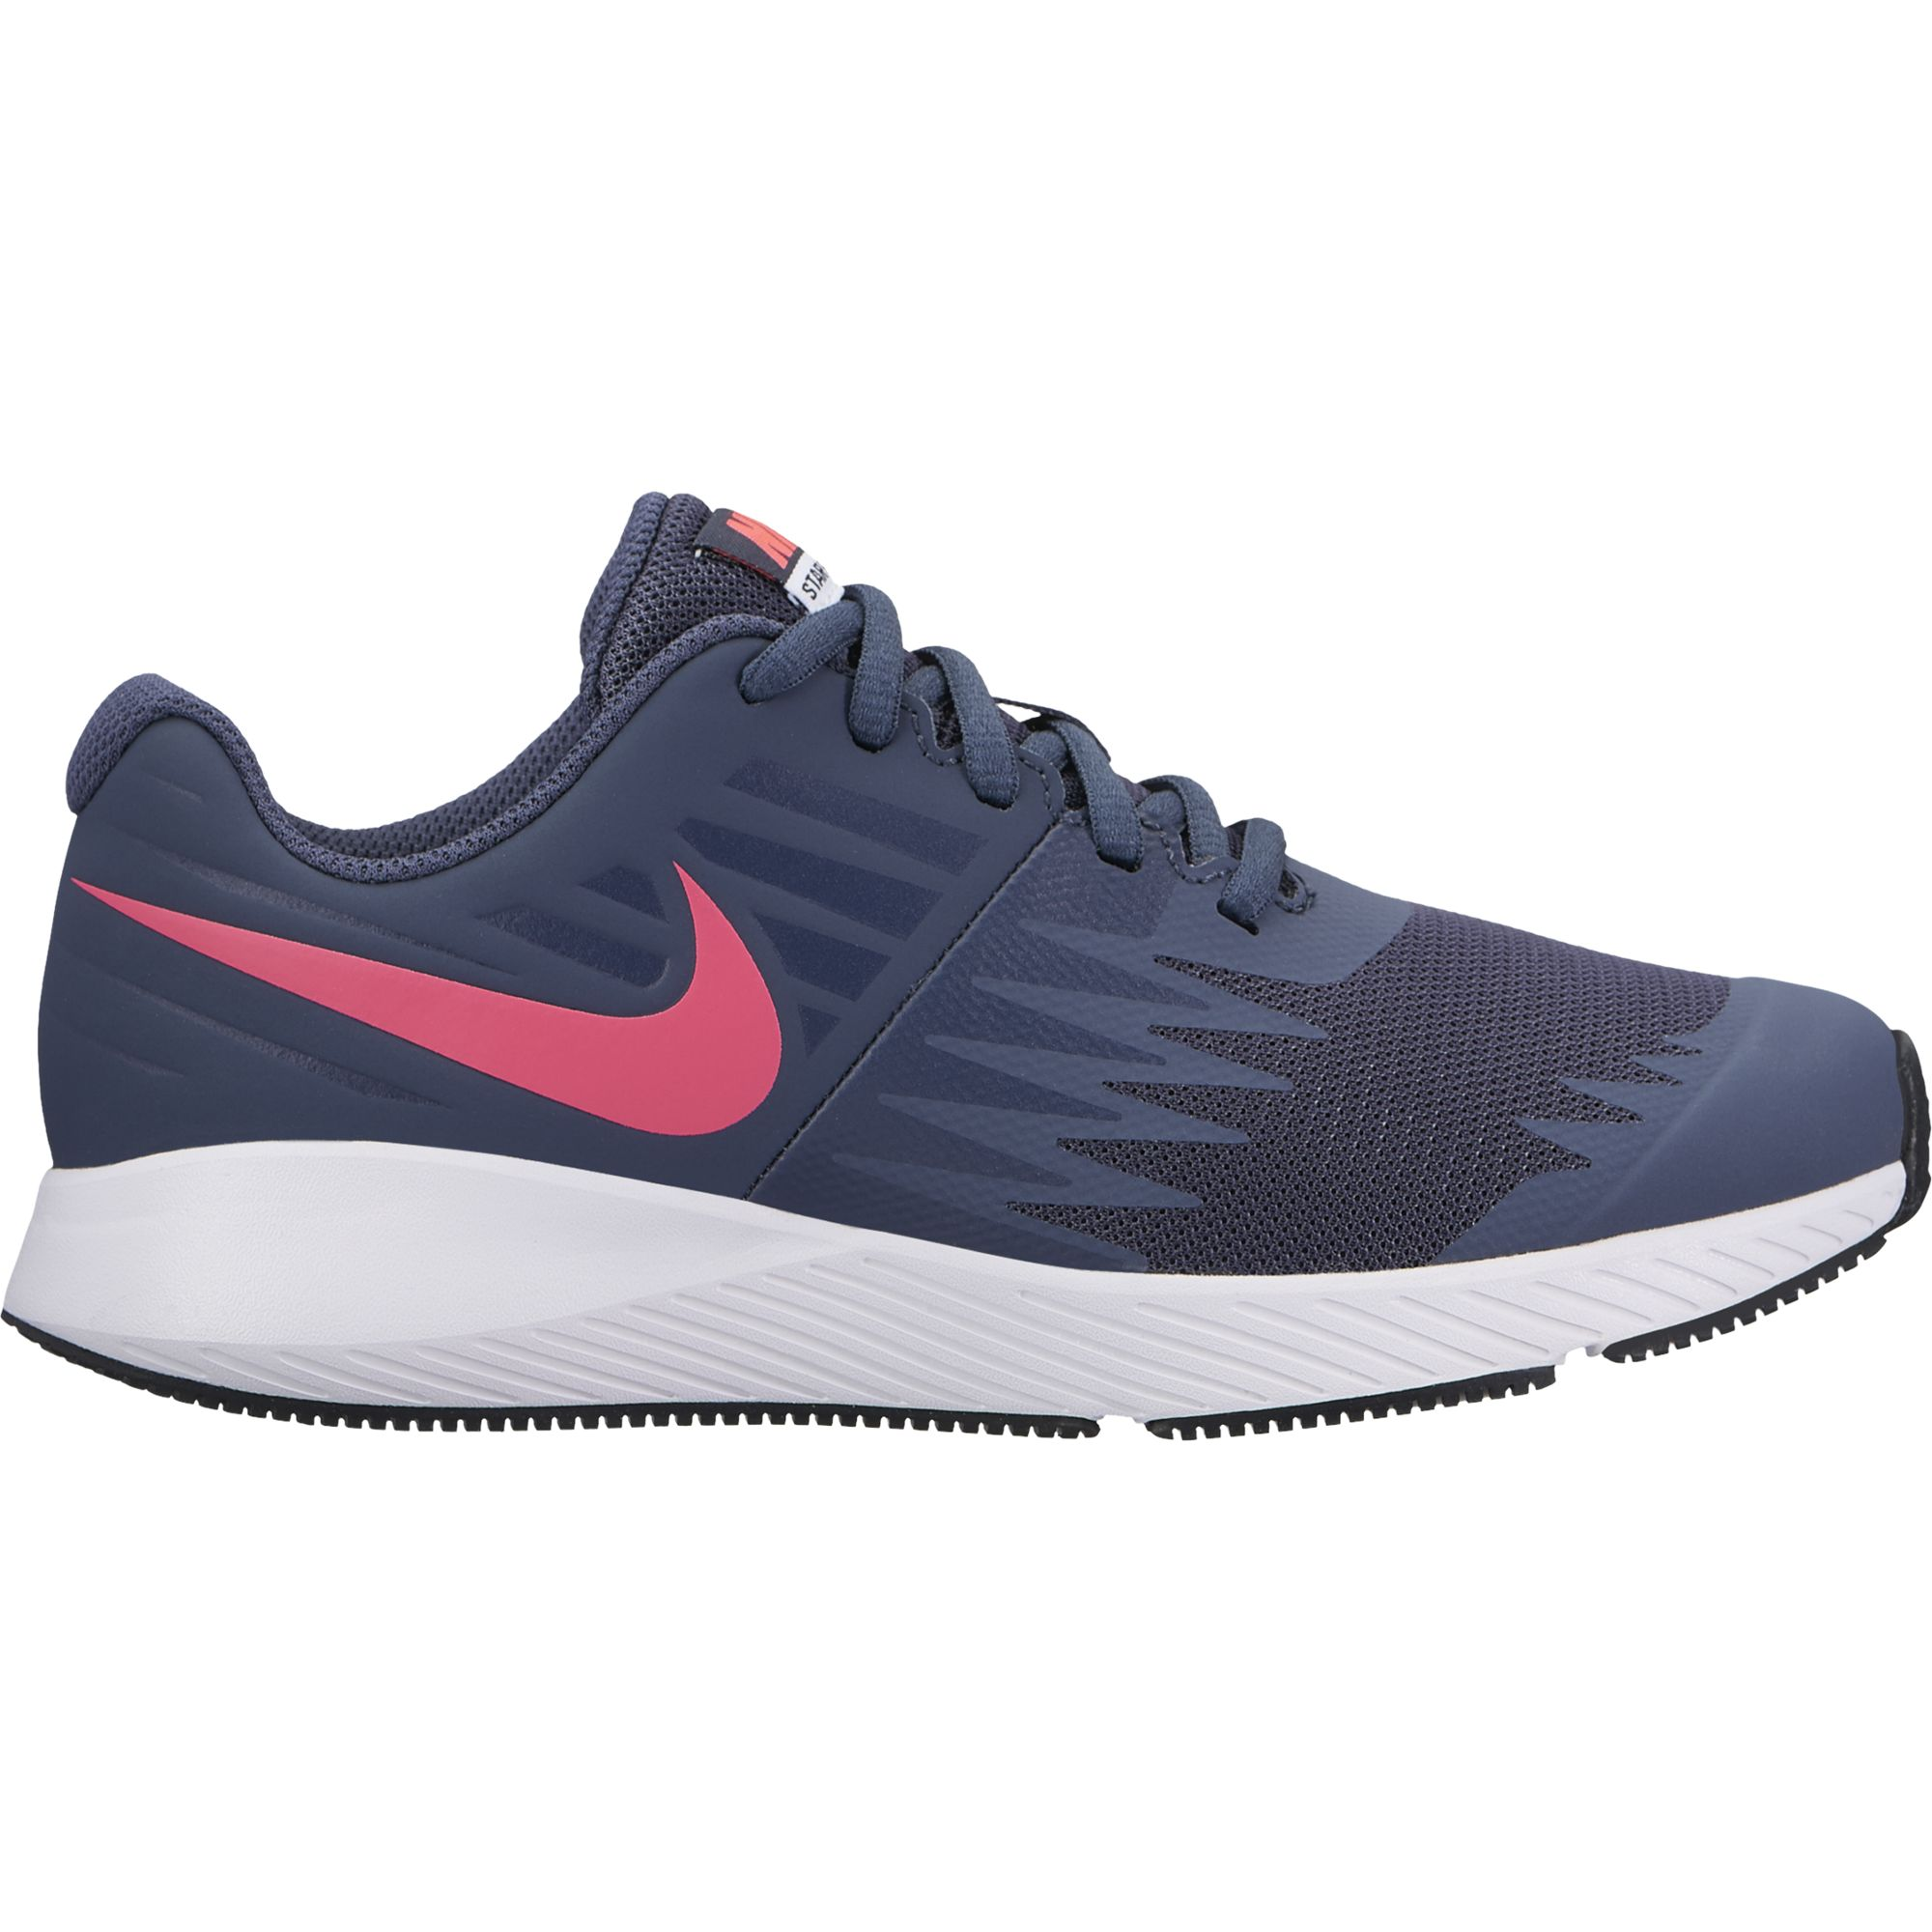 e9d3a8535c58c Girl s Nike Star Runner (GS) Running Shoe - Sieverts Sporting Goods